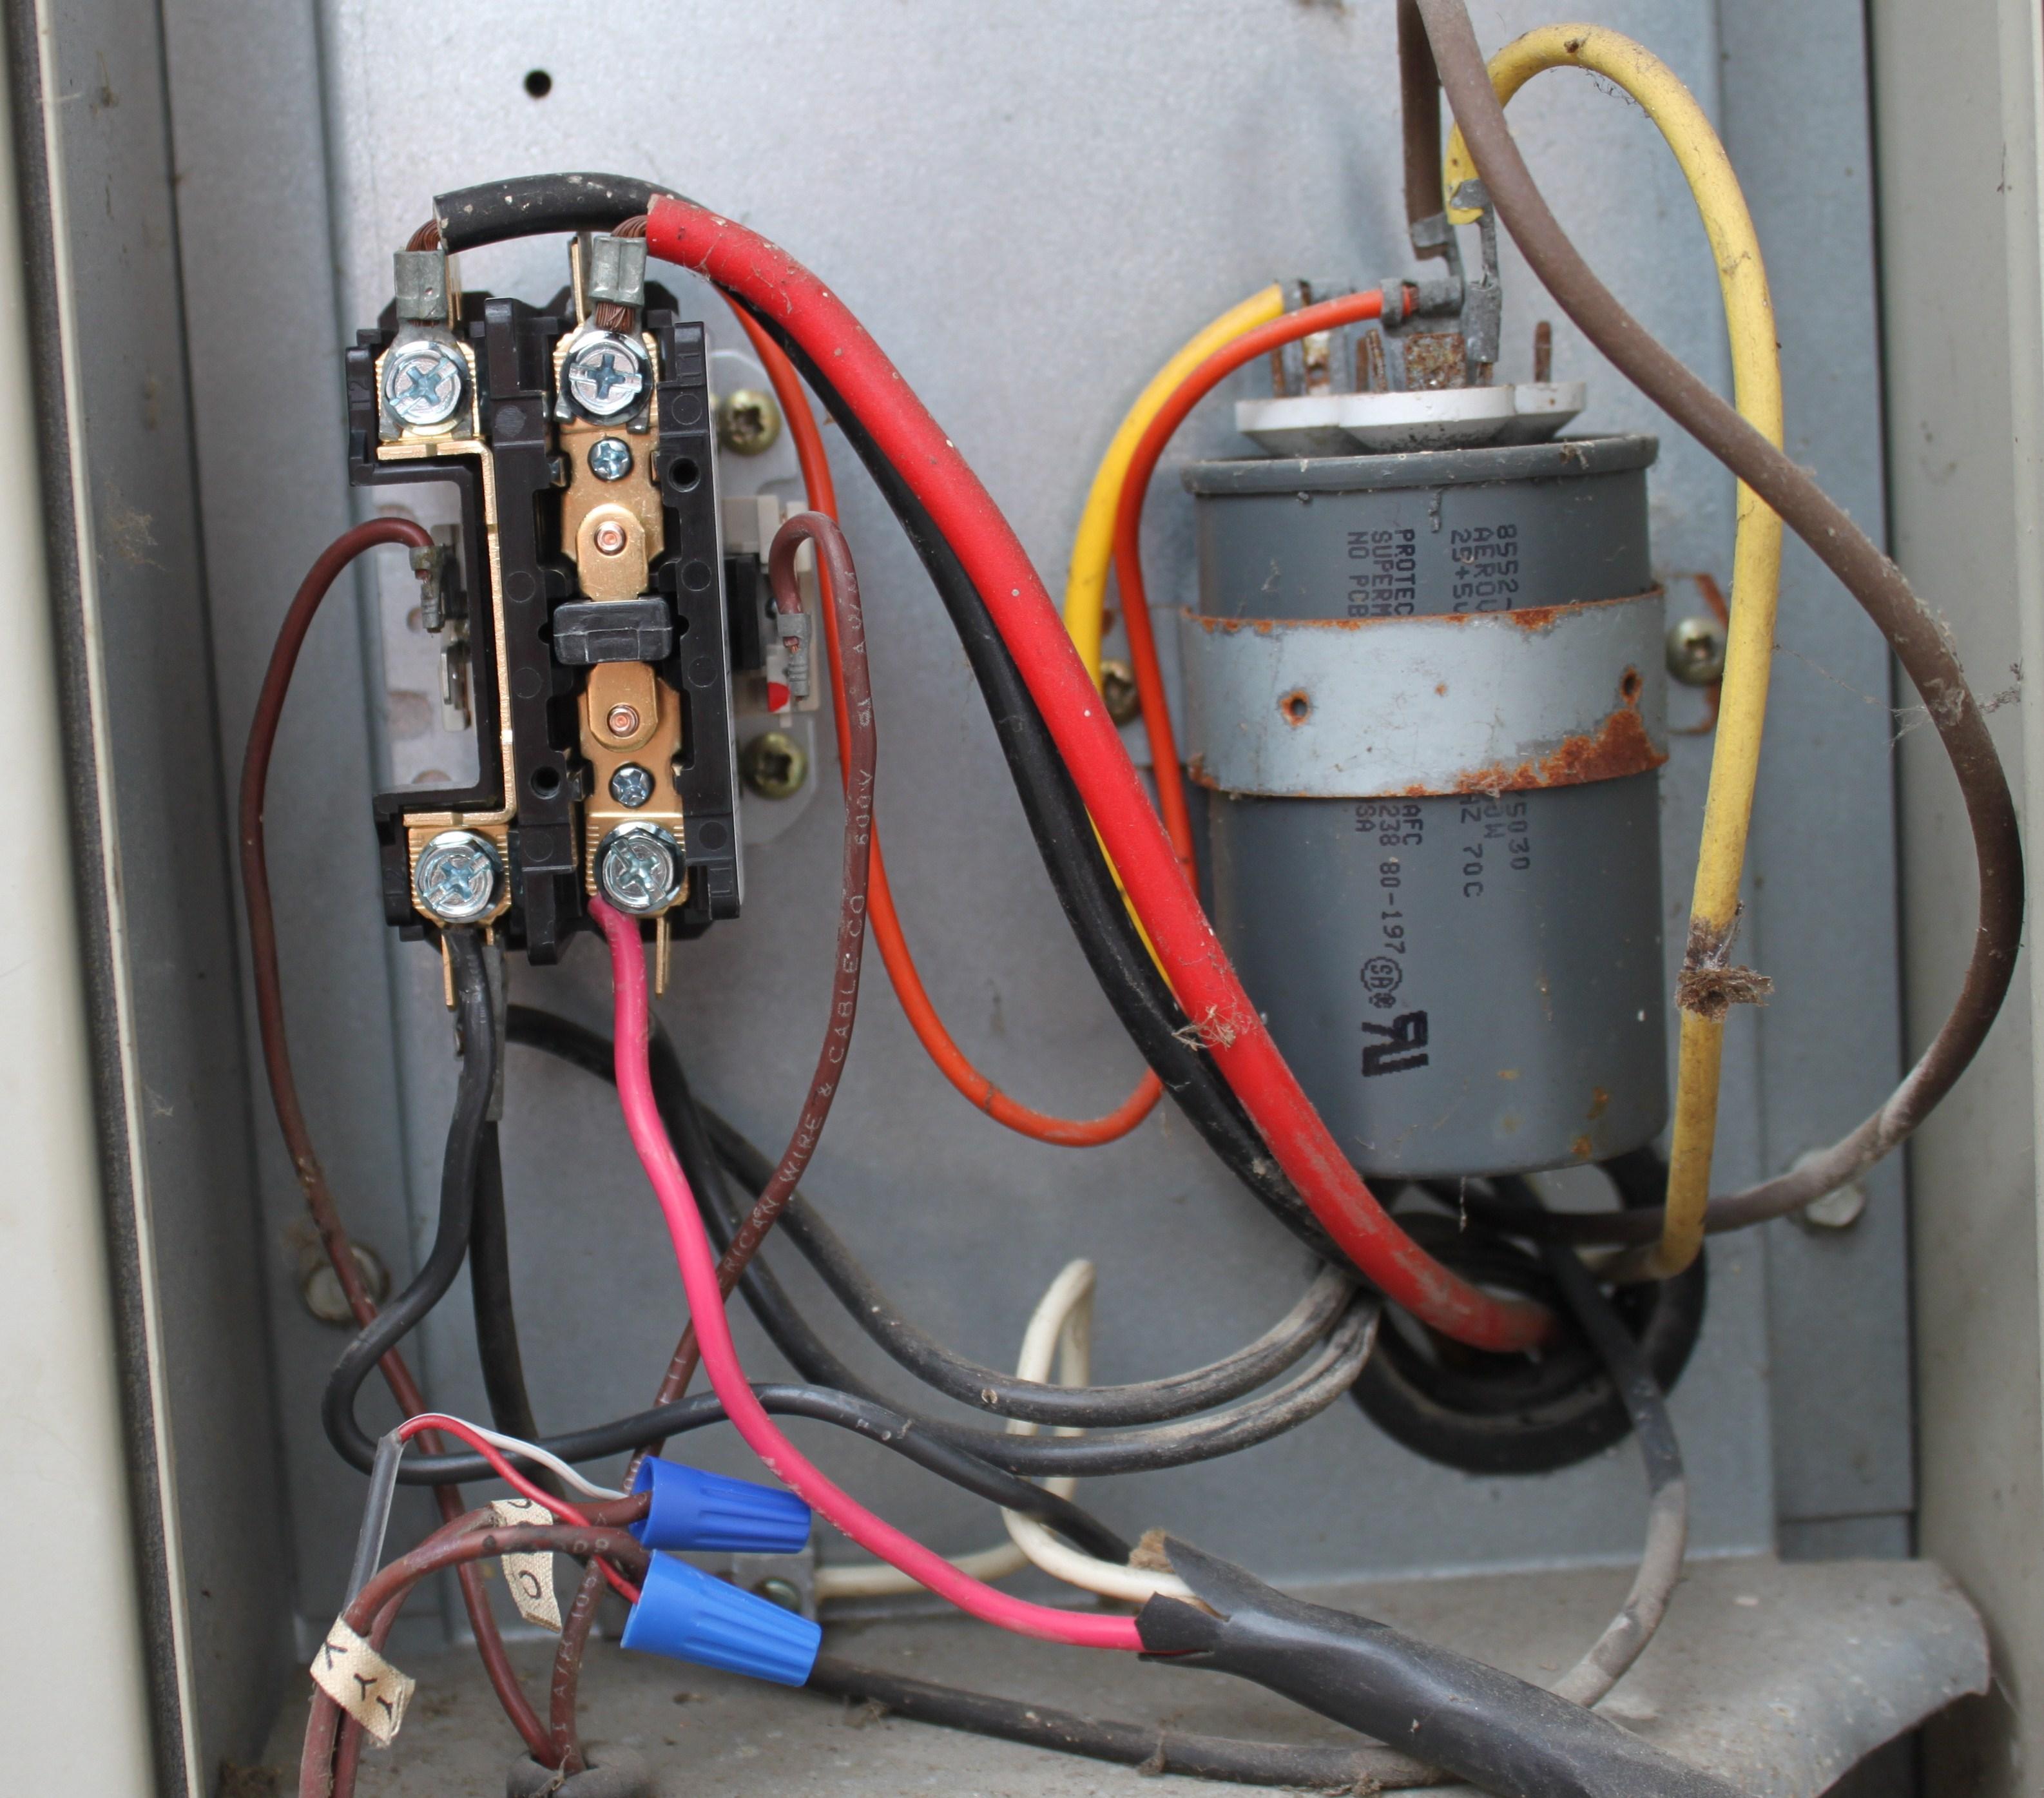 Carrier Contactor Wiring Diagram - Led Ke Light Turn Signal Wiring Diagram  for Wiring Diagram SchematicsWiring Diagram Schematics